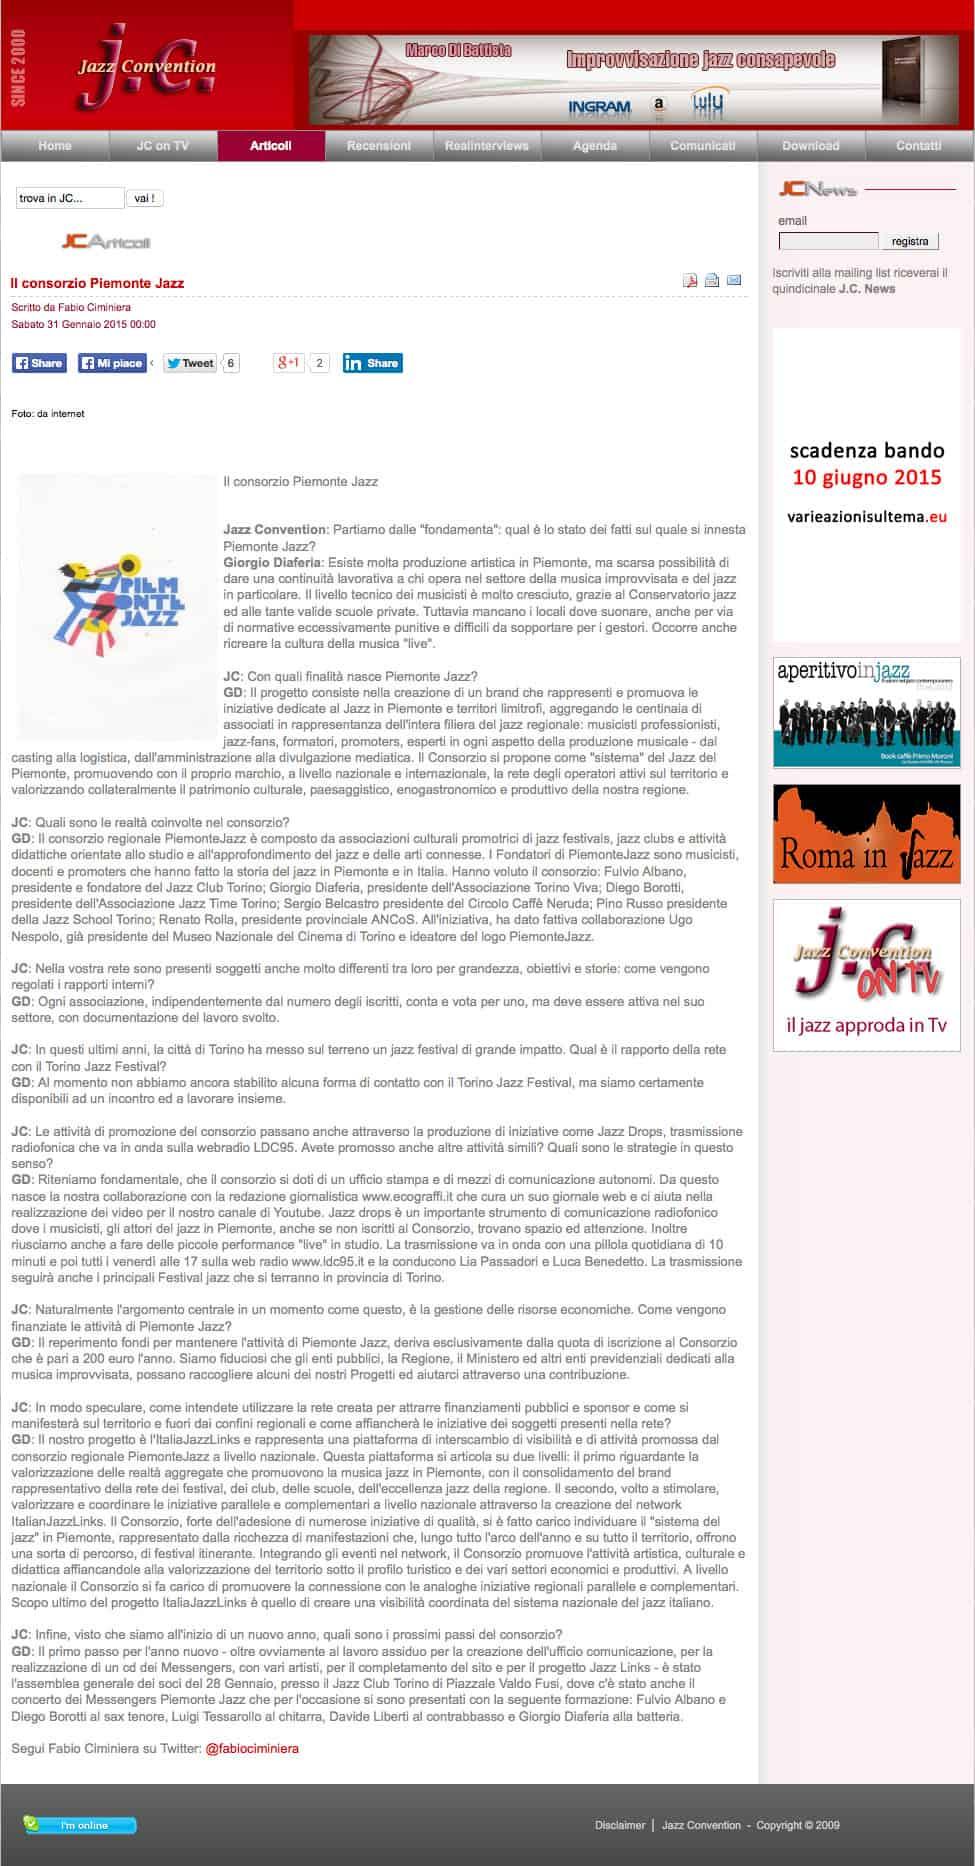 JazzConvention-Il-Consorzio-Piemonte-Jazz-Intervista-a-Giorgio-Diaferia